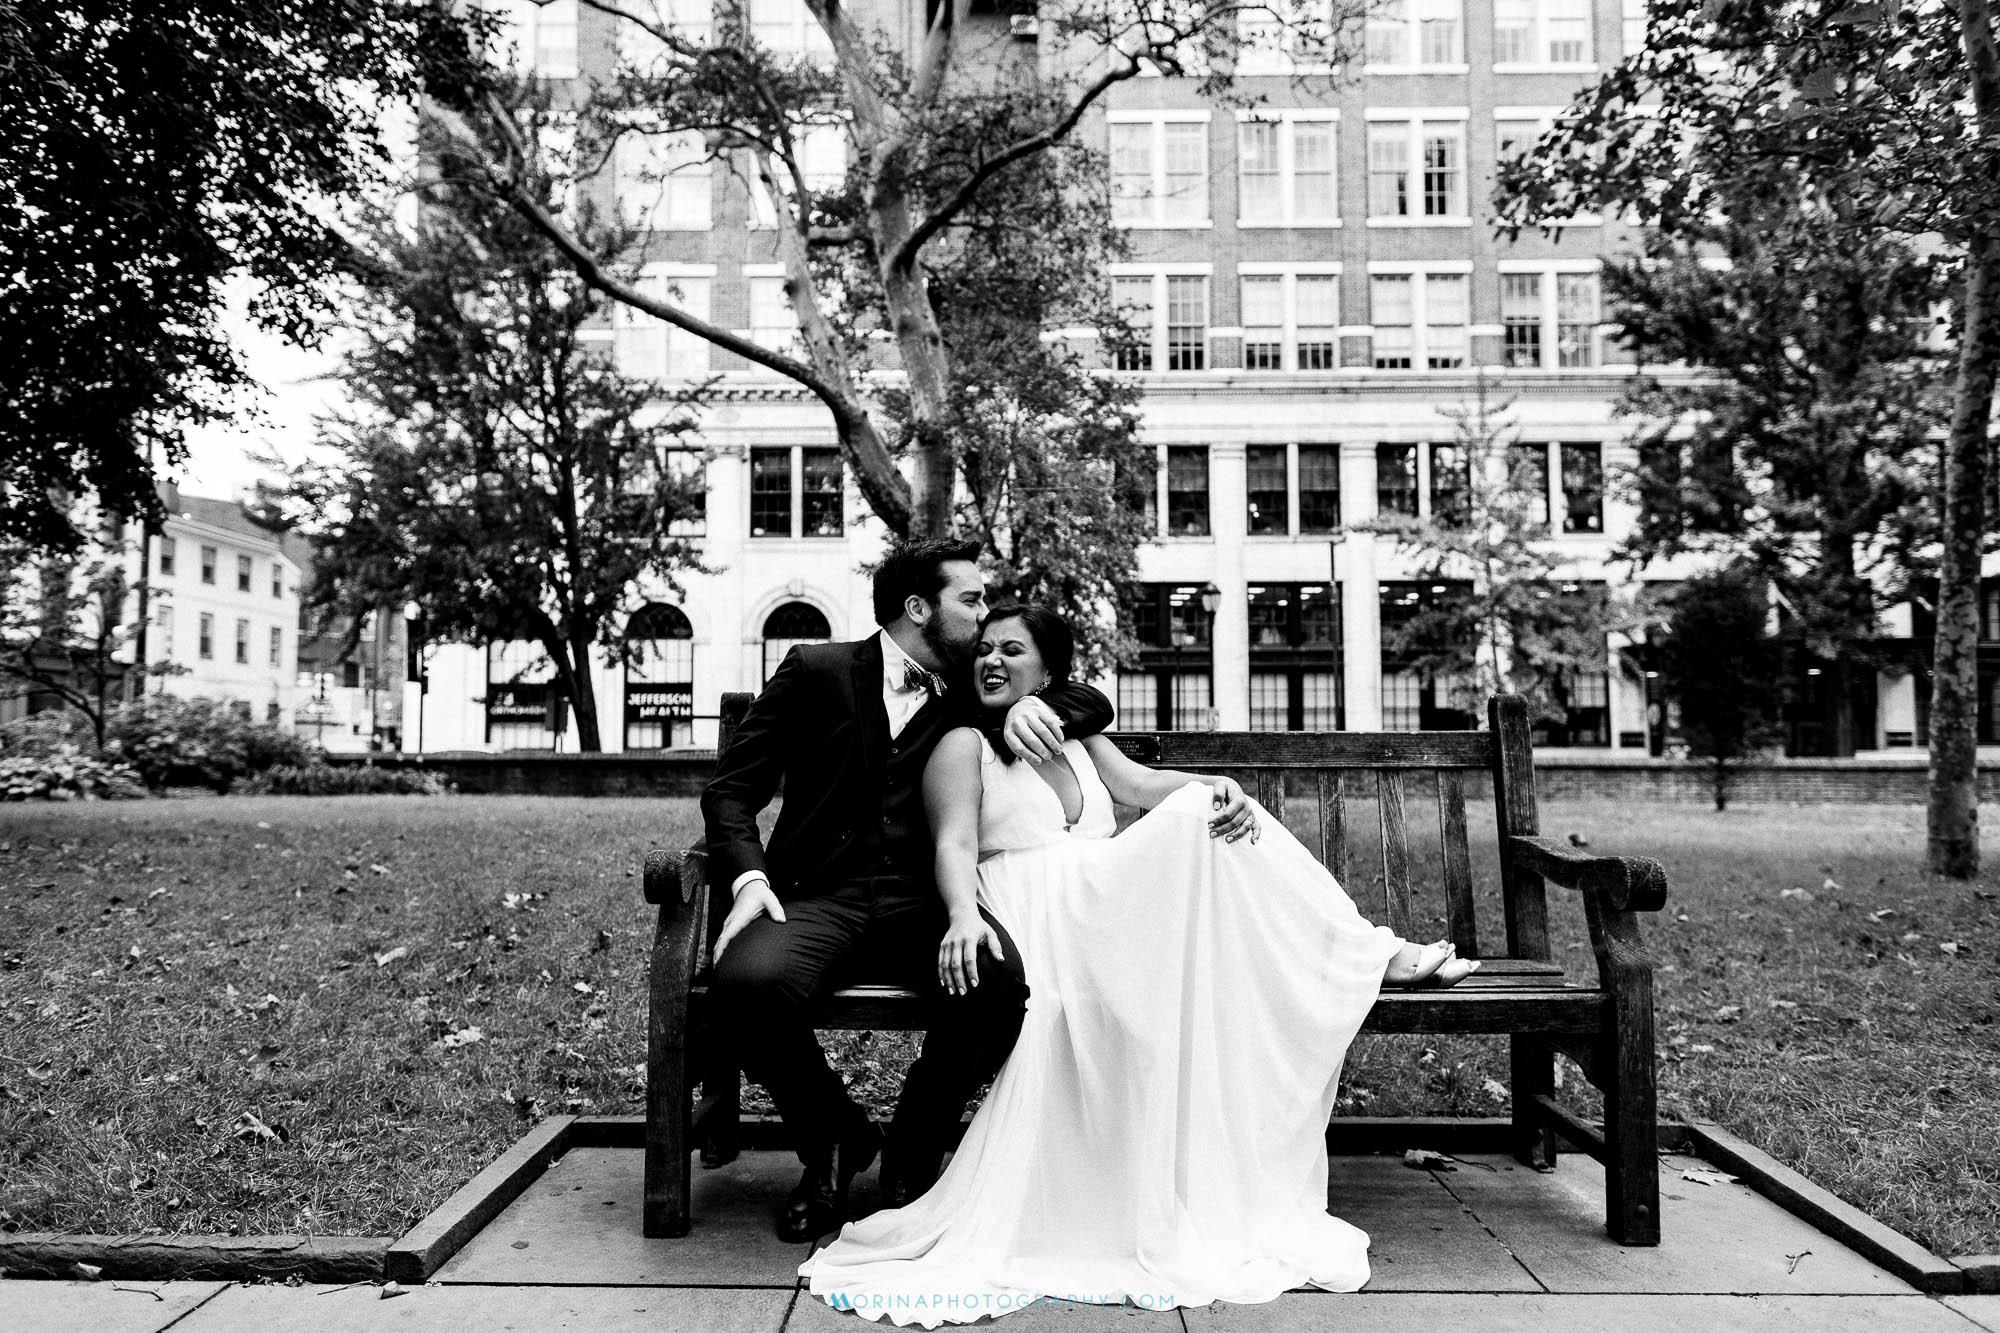 Yuki & Michael Wedding at Morris House Hotel Blog 0040.jpg